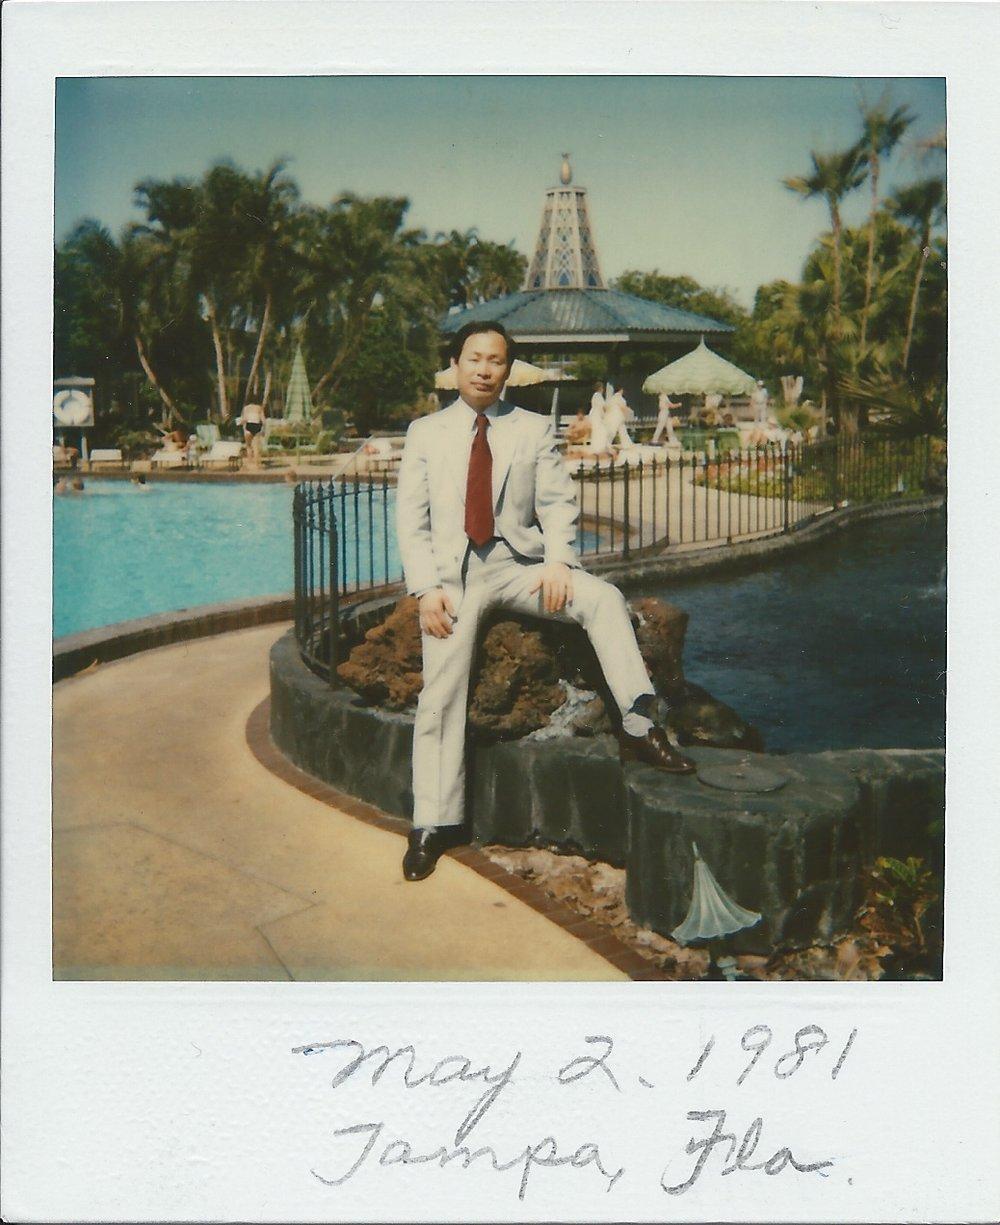 0367 Grandmaster Lee Tampa Florida 1981-05-02.jpg